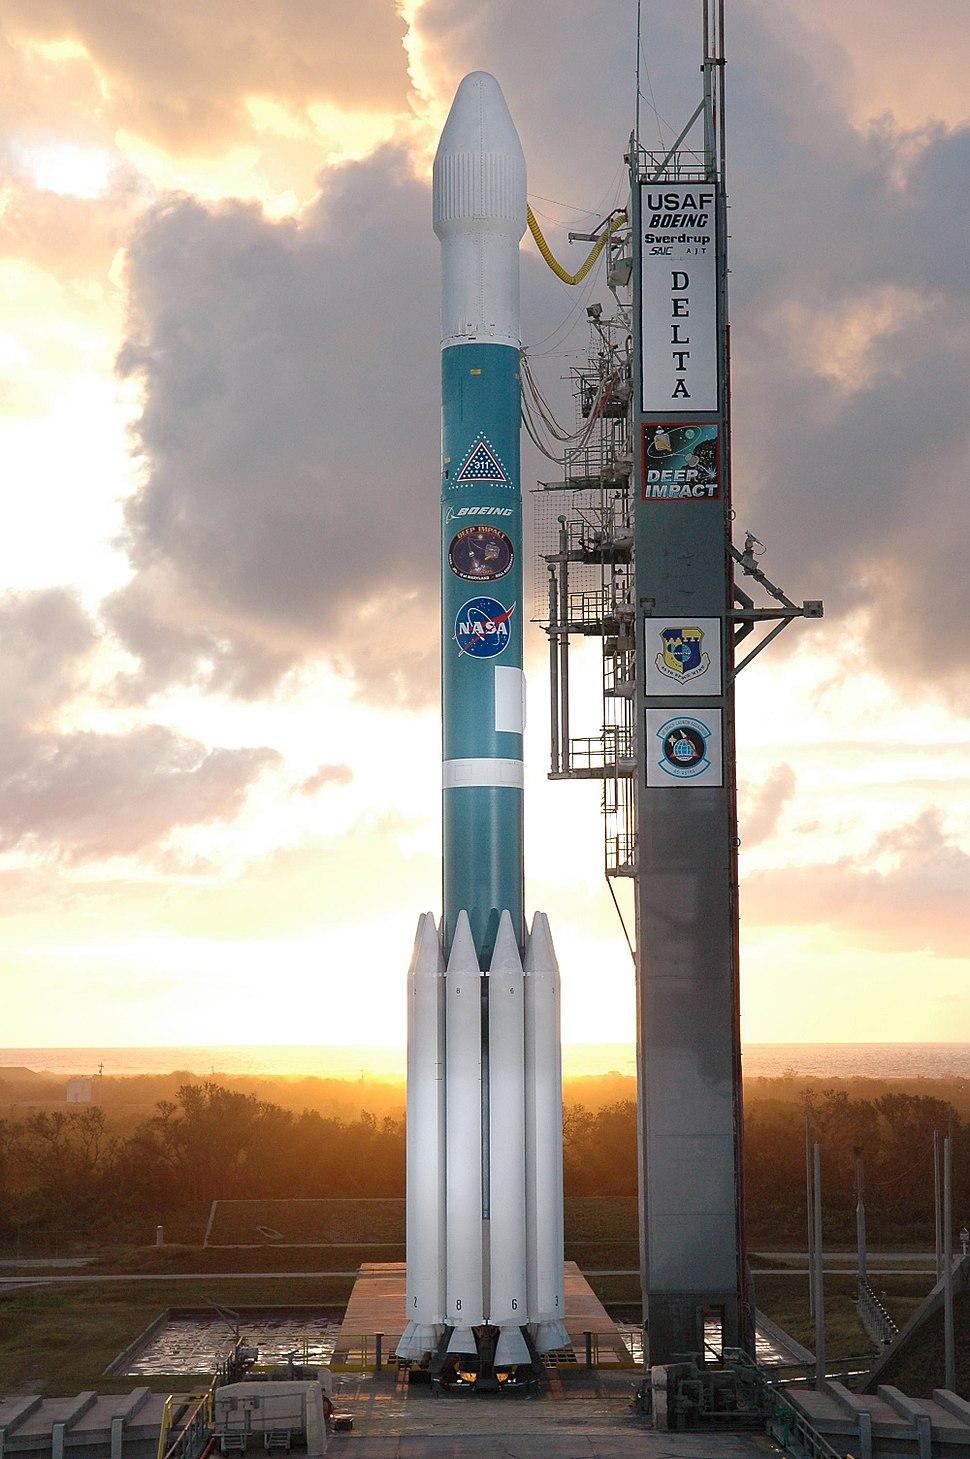 Delta II 7925 (2925) rocket with Deep Impact